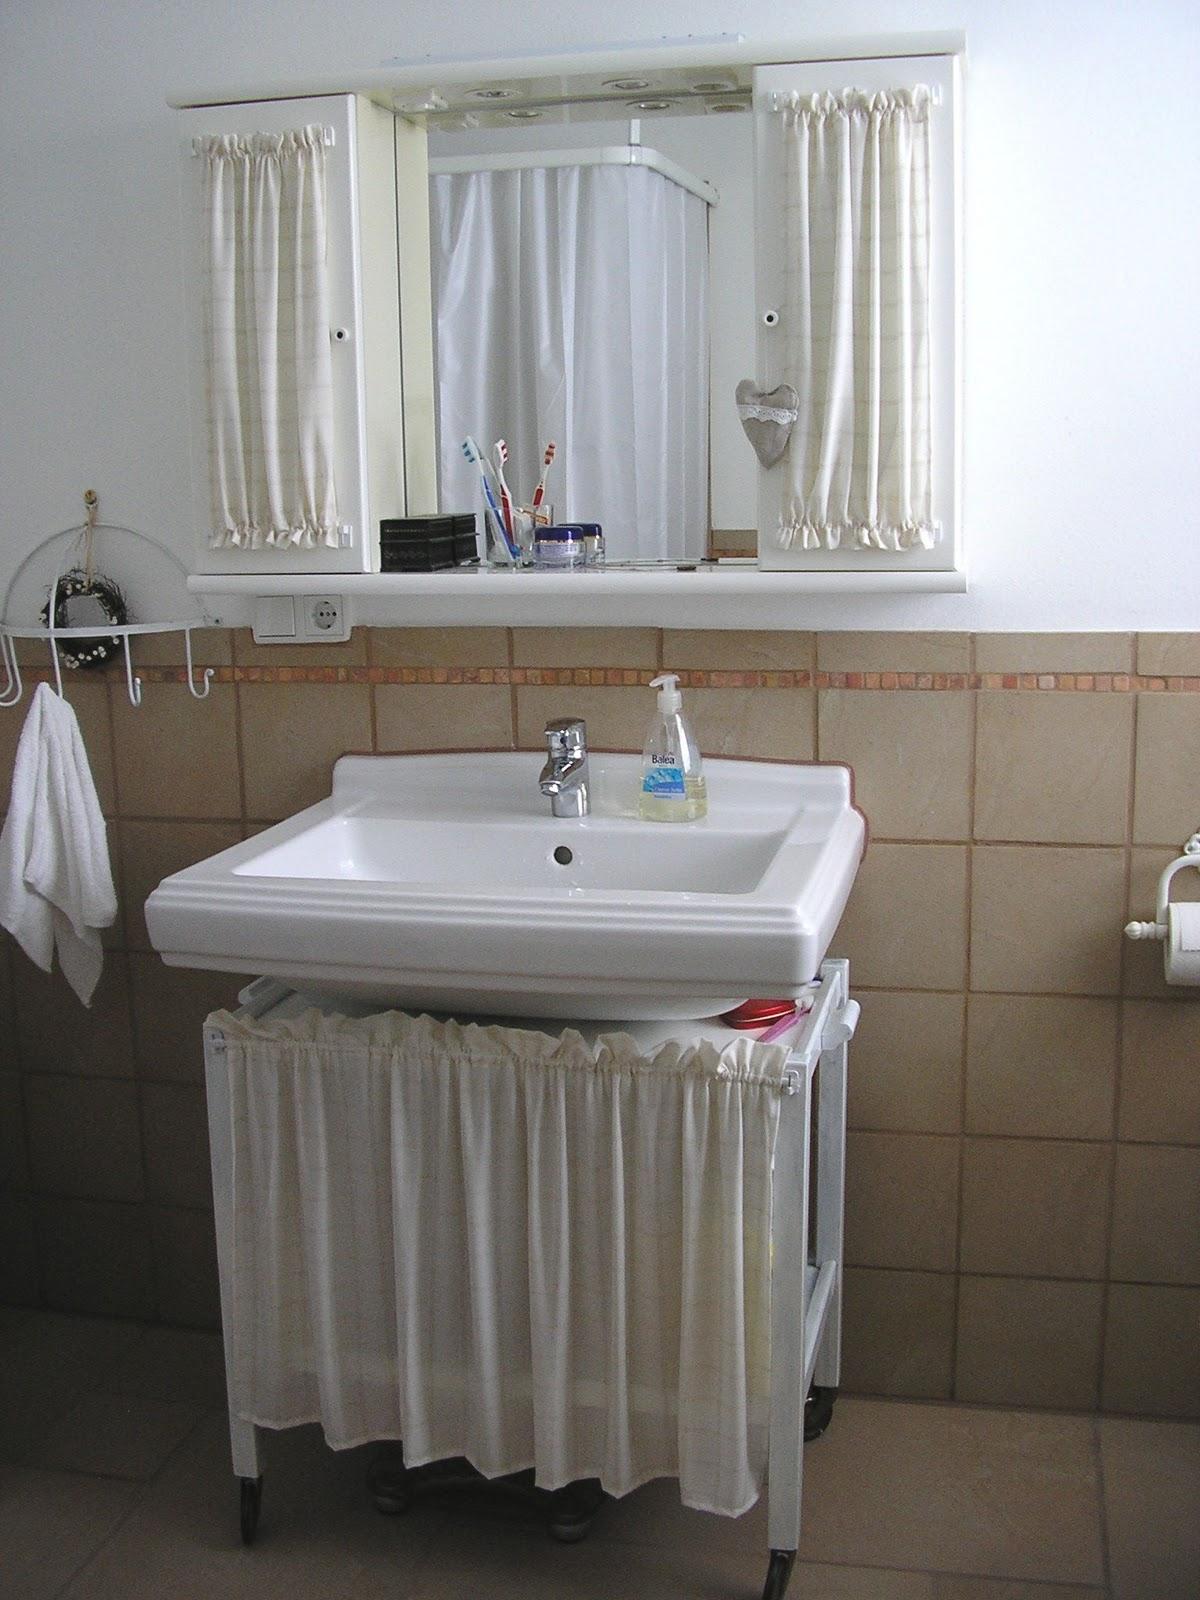 mal das mal dies mein landhaus bad. Black Bedroom Furniture Sets. Home Design Ideas